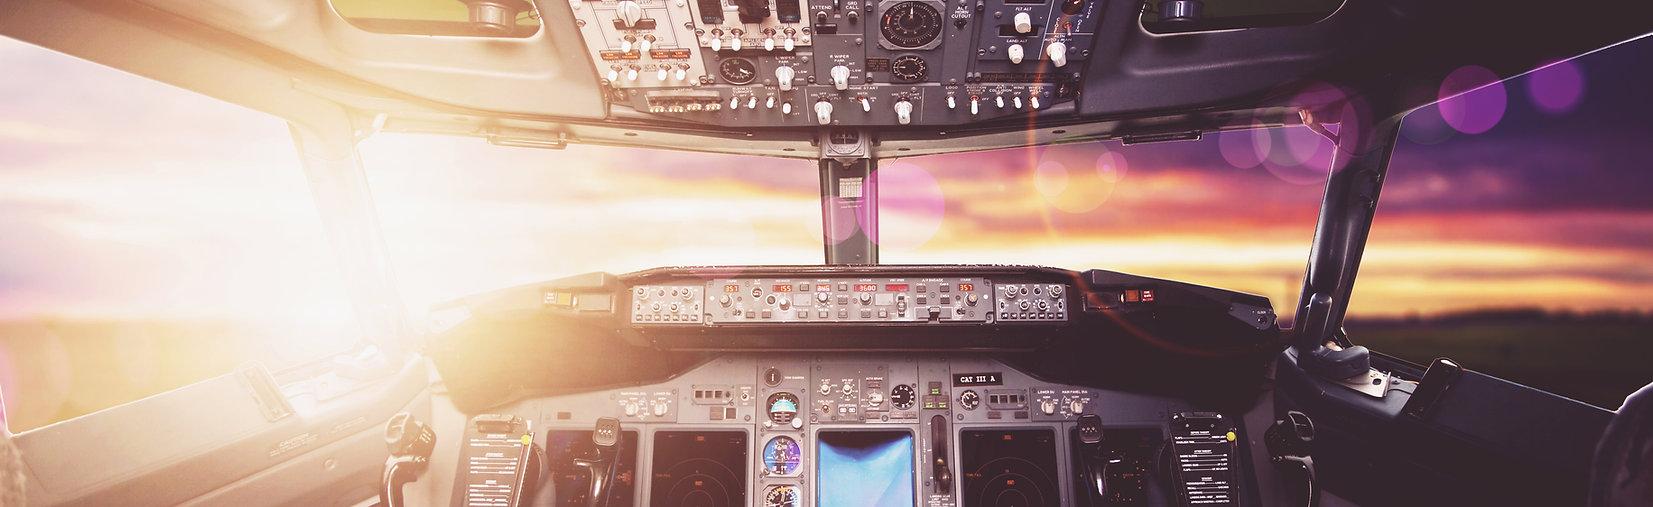 Aircraft interior, cockpit view inside t